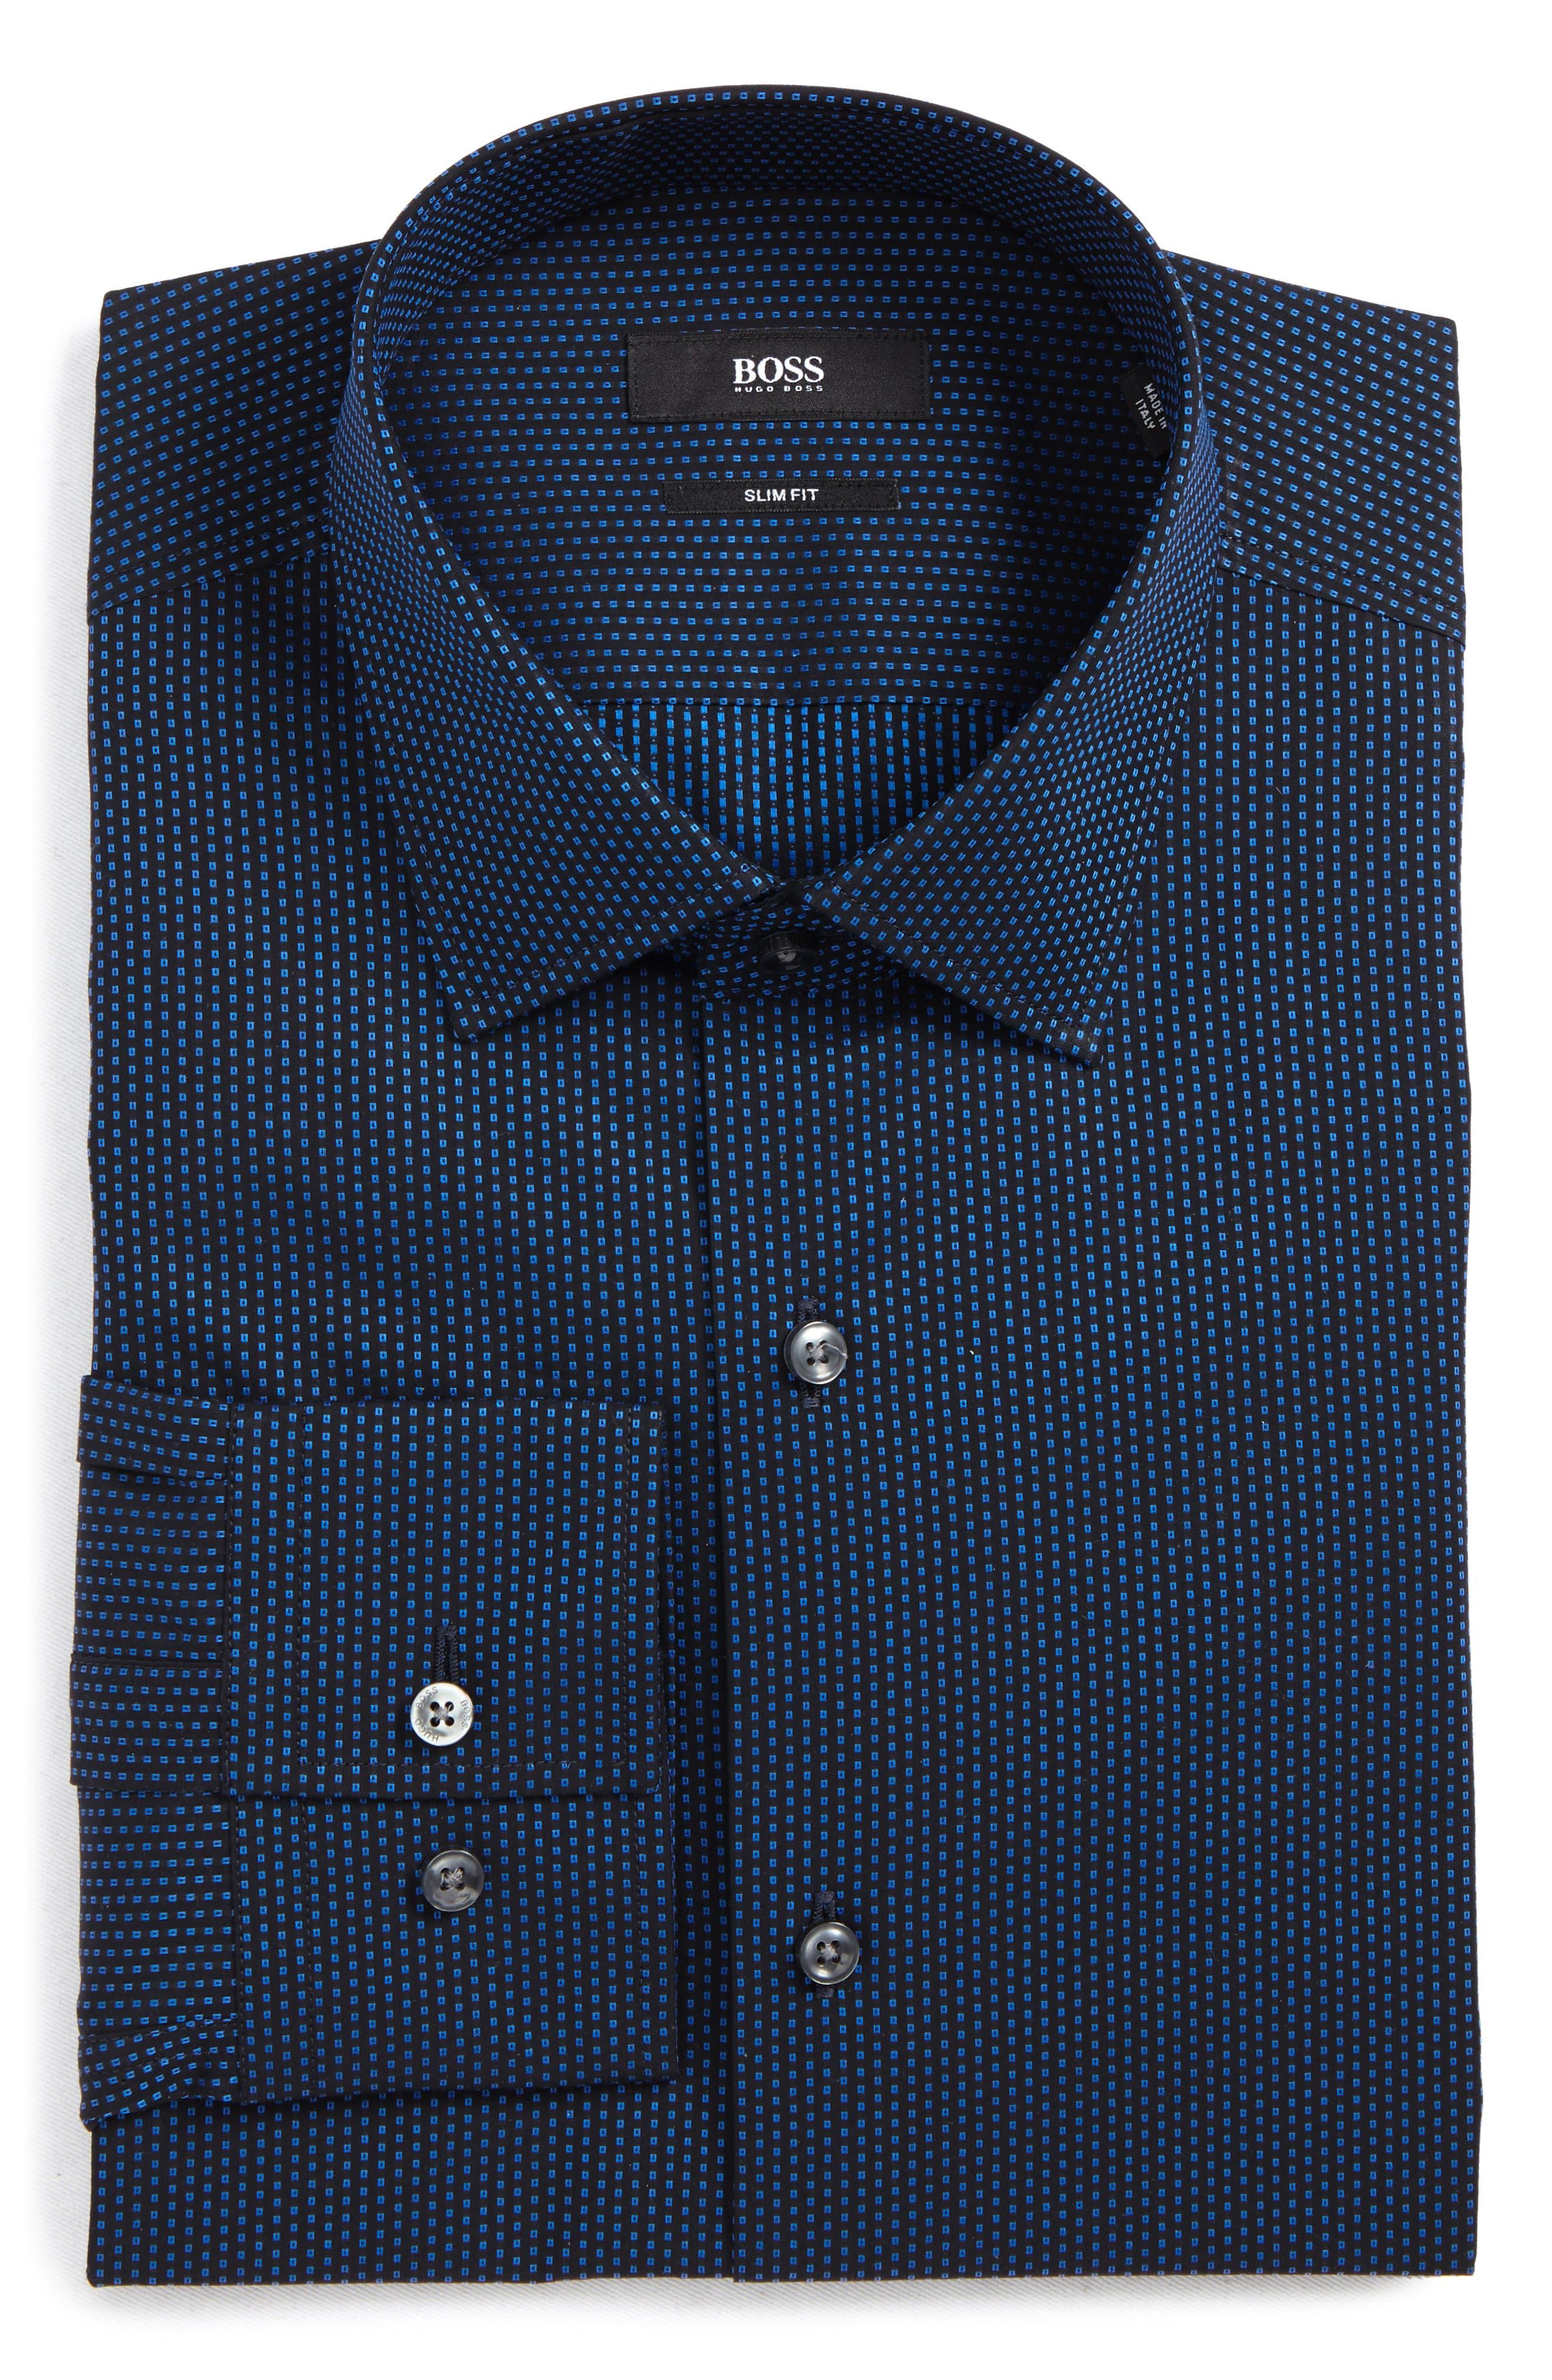 Jenno Slim Fit Print Dress Shirt,                         Main,                         color, Navy